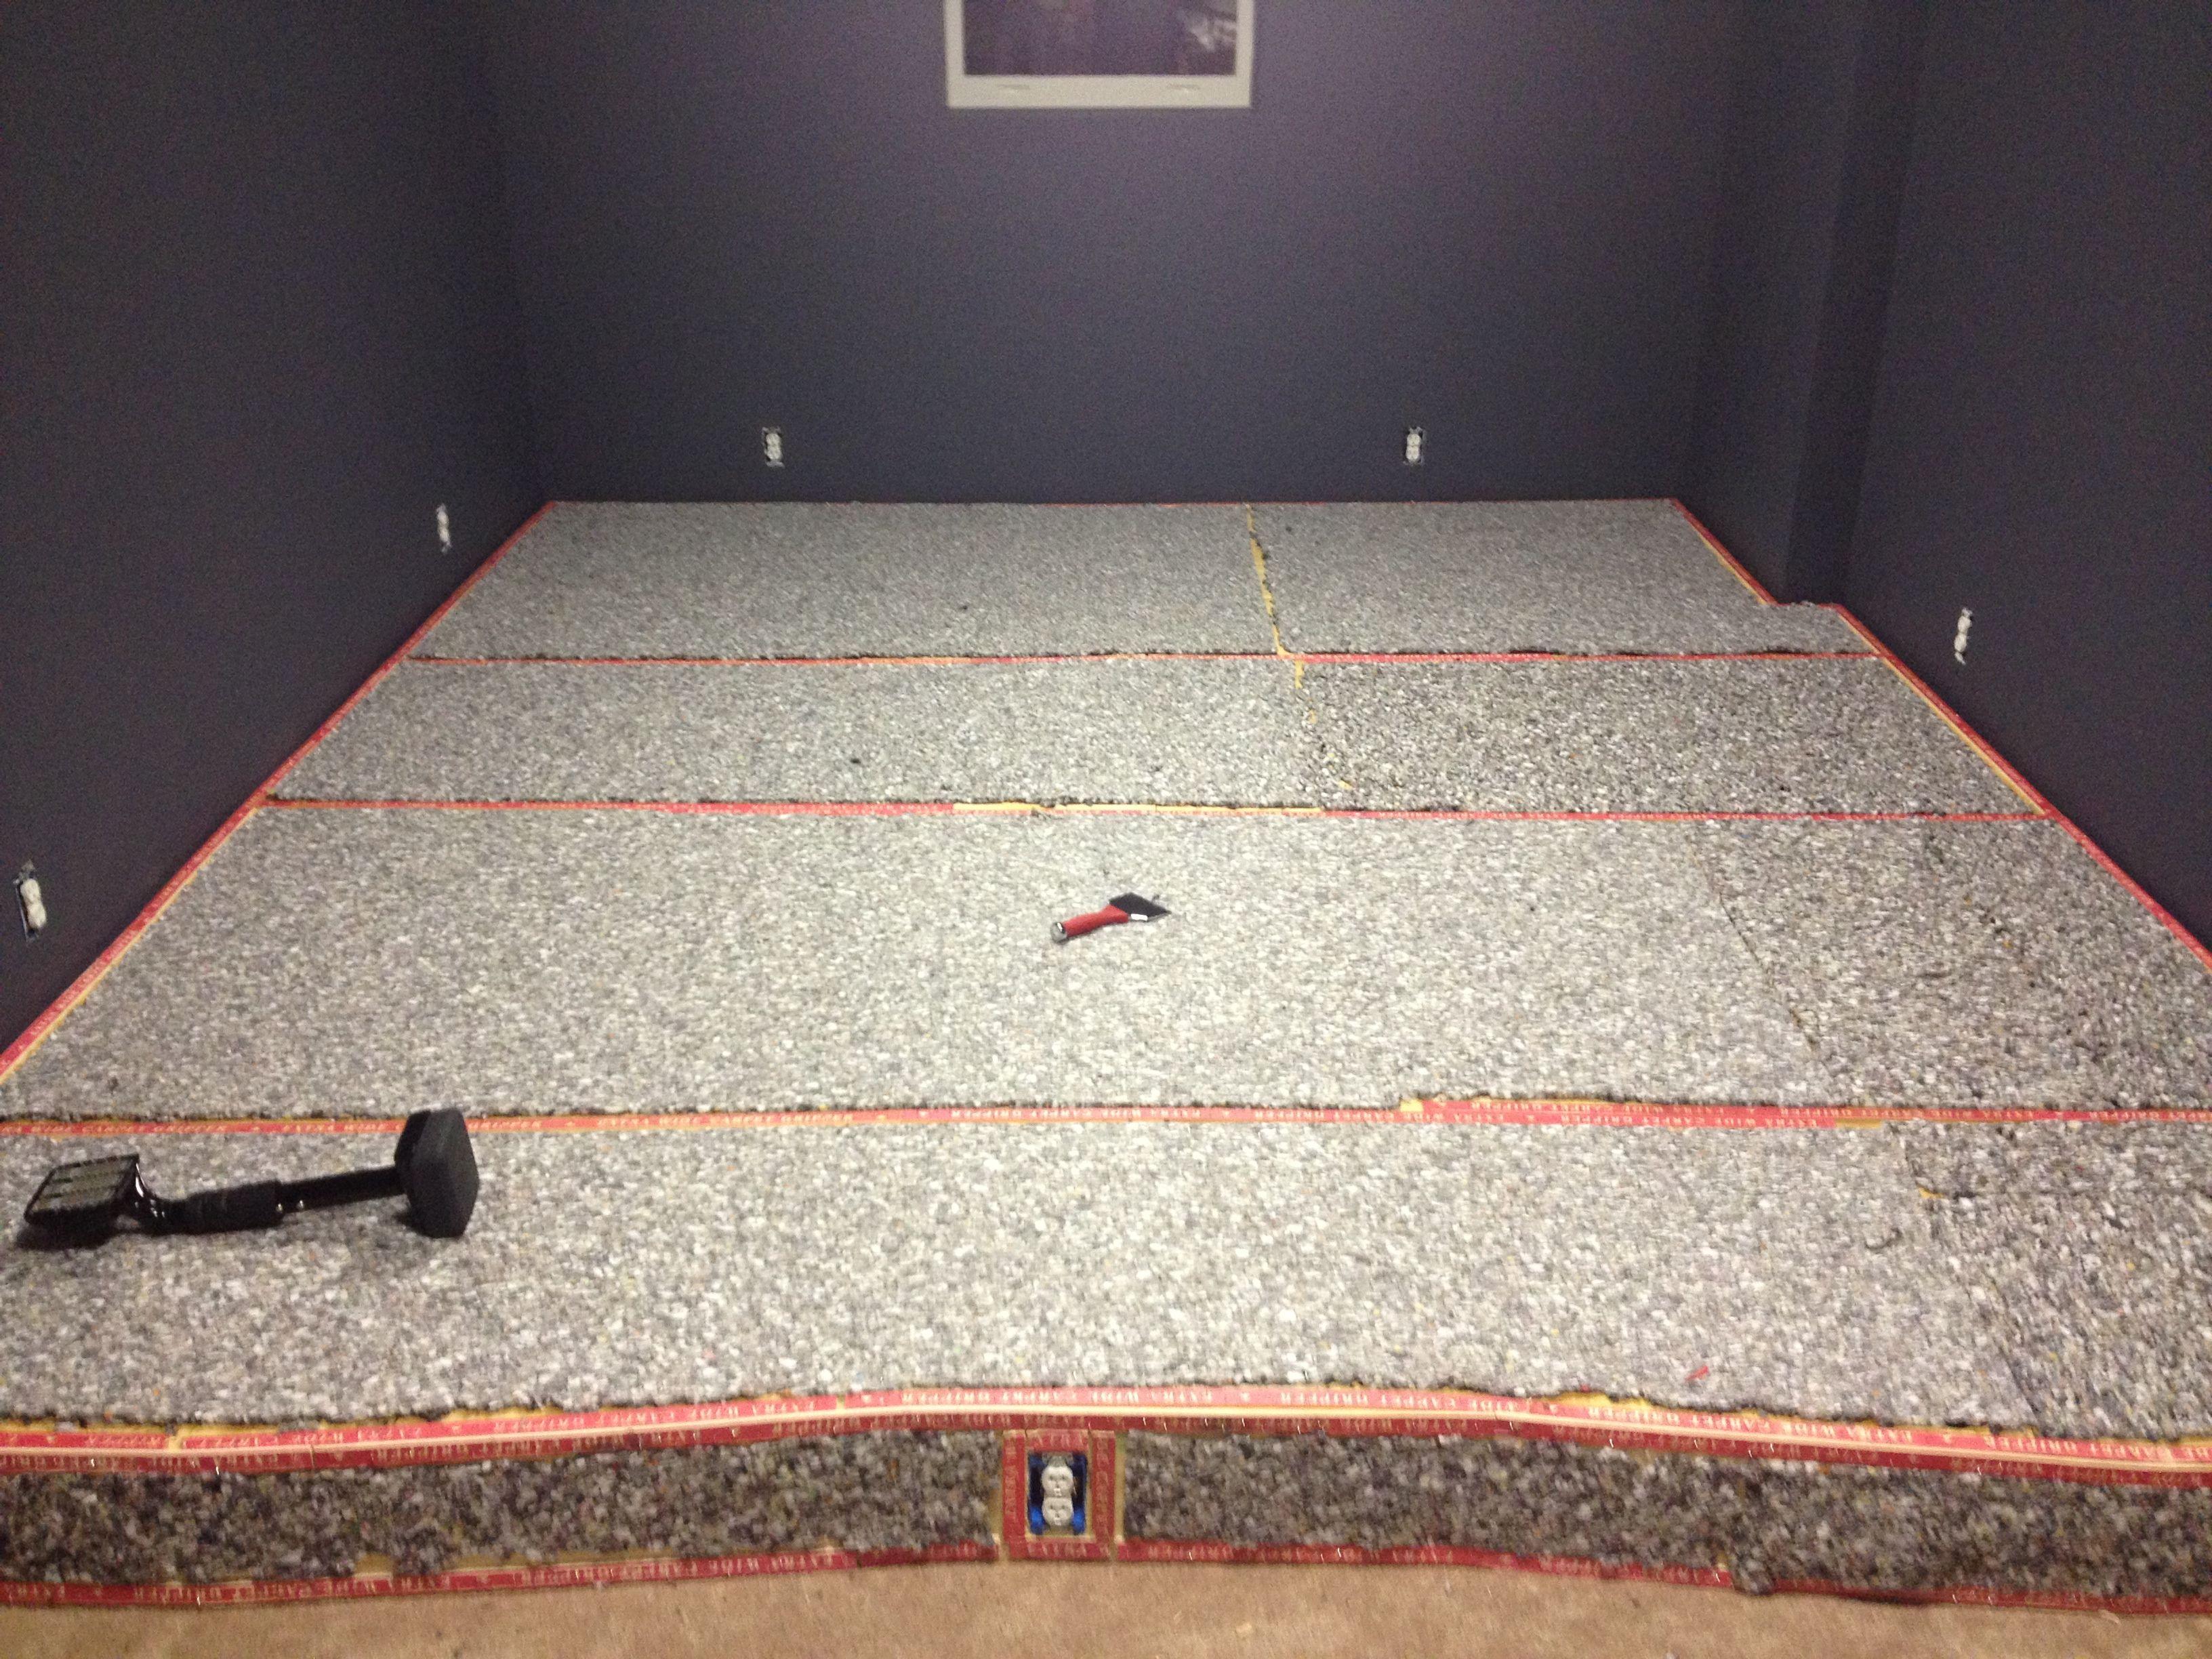 Adding Carpet Padding To The Seat Risers Carpet Padding Kids Rugs Home Theater